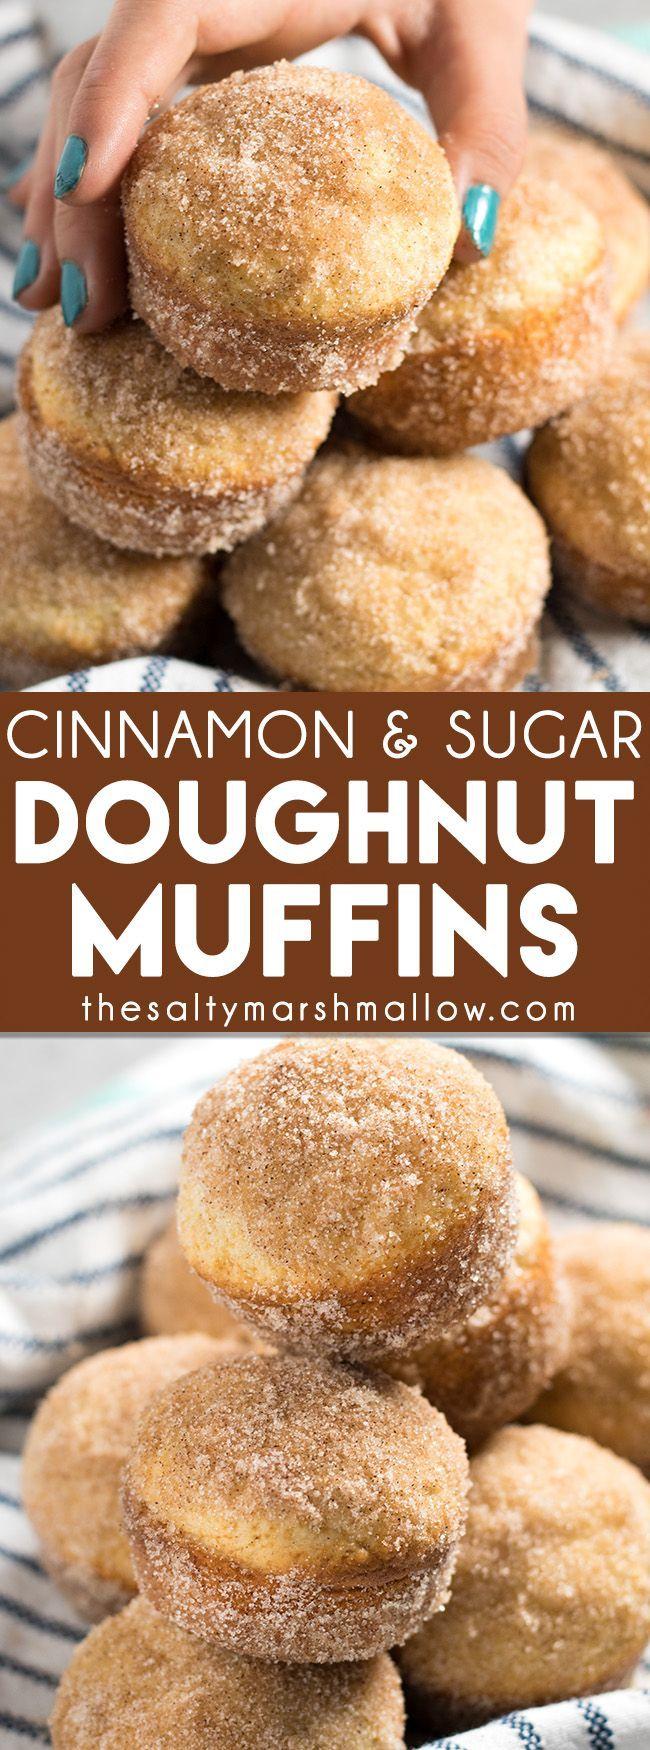 Cinnamon Sugar Donut Muffins #foodanddrink